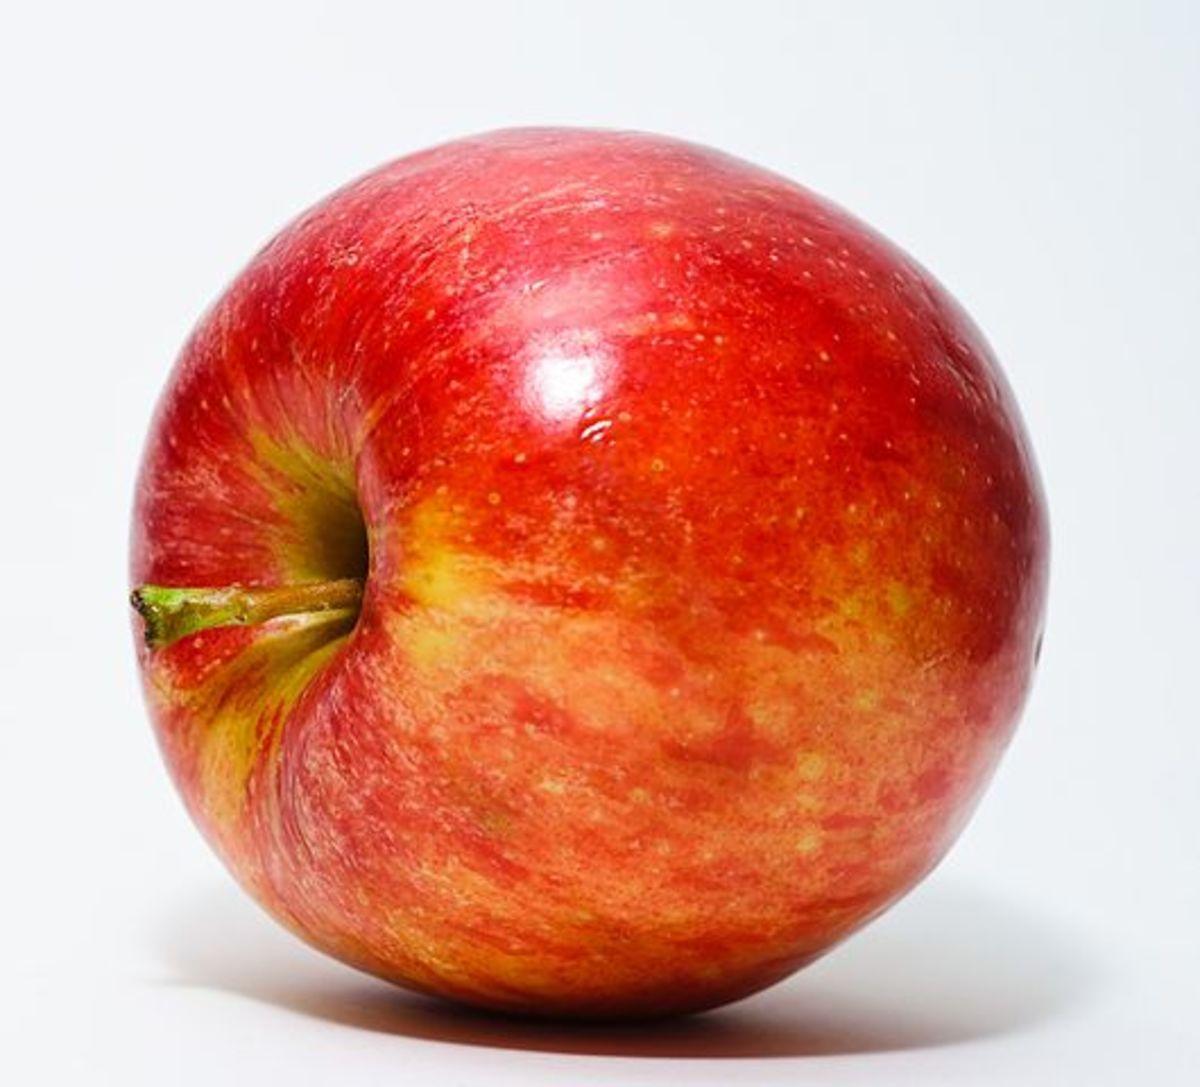 An Apple ... yam yam